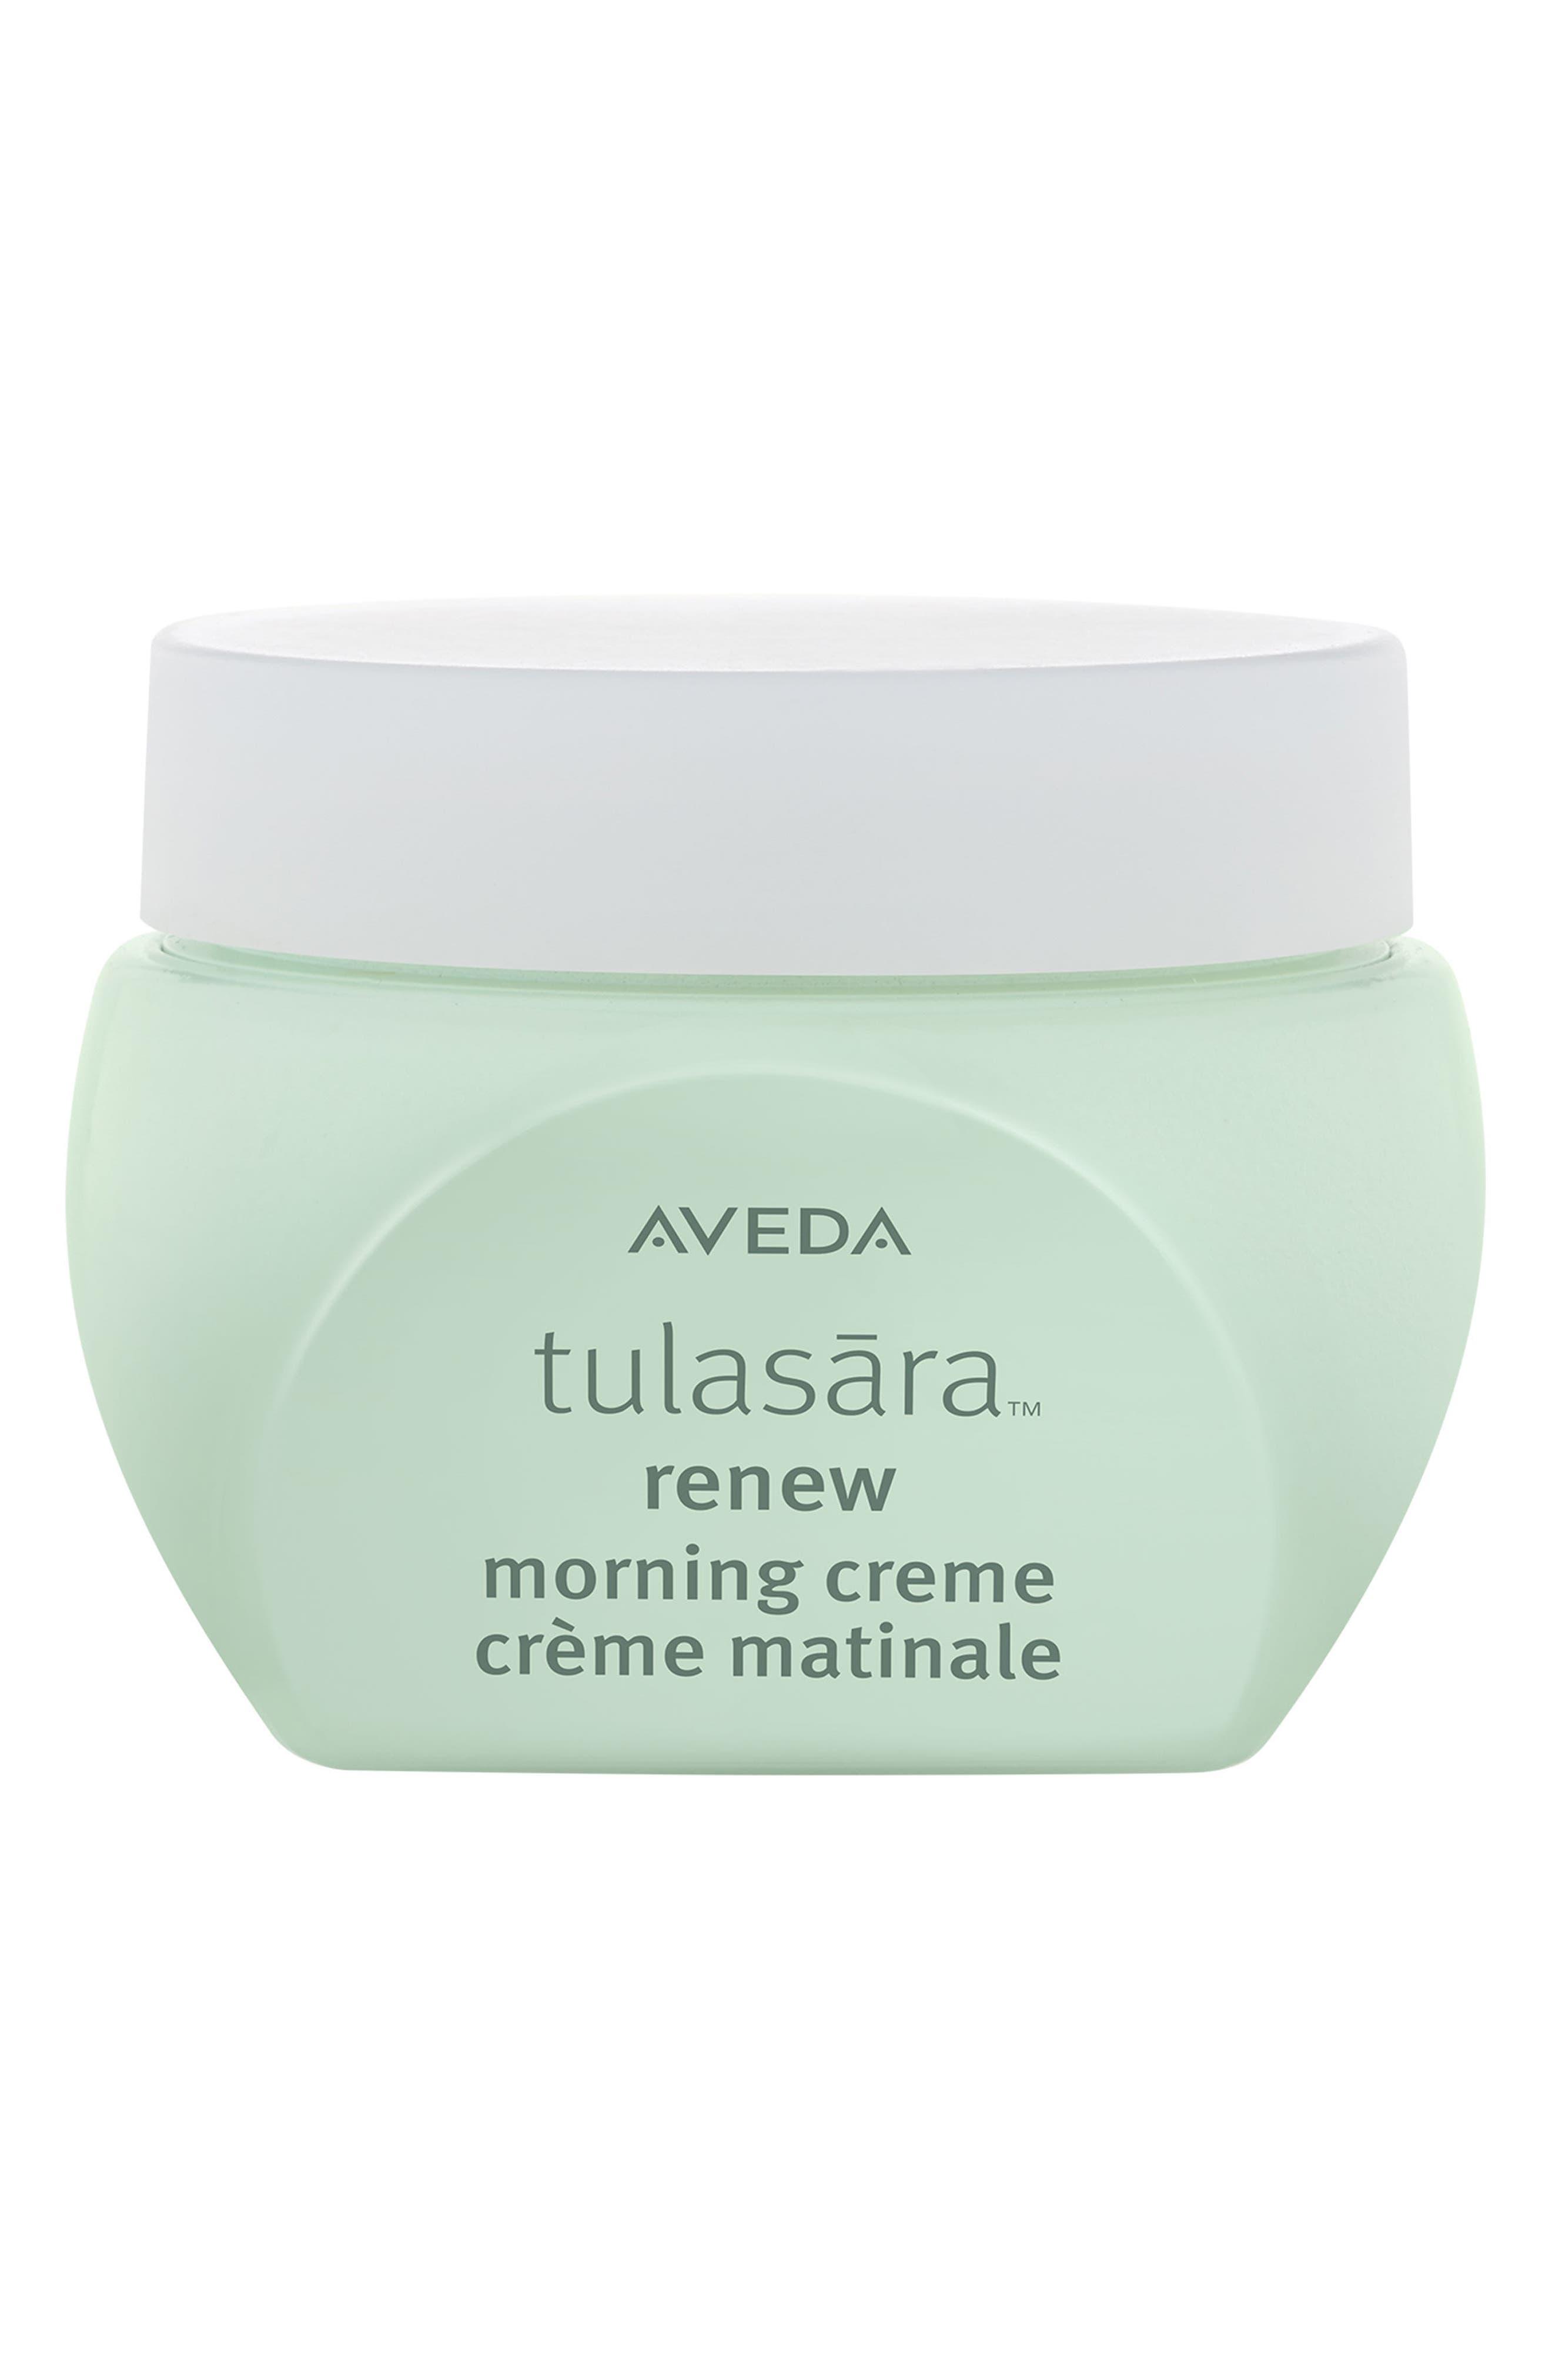 Aveda tulasara™ renew Morning Crème